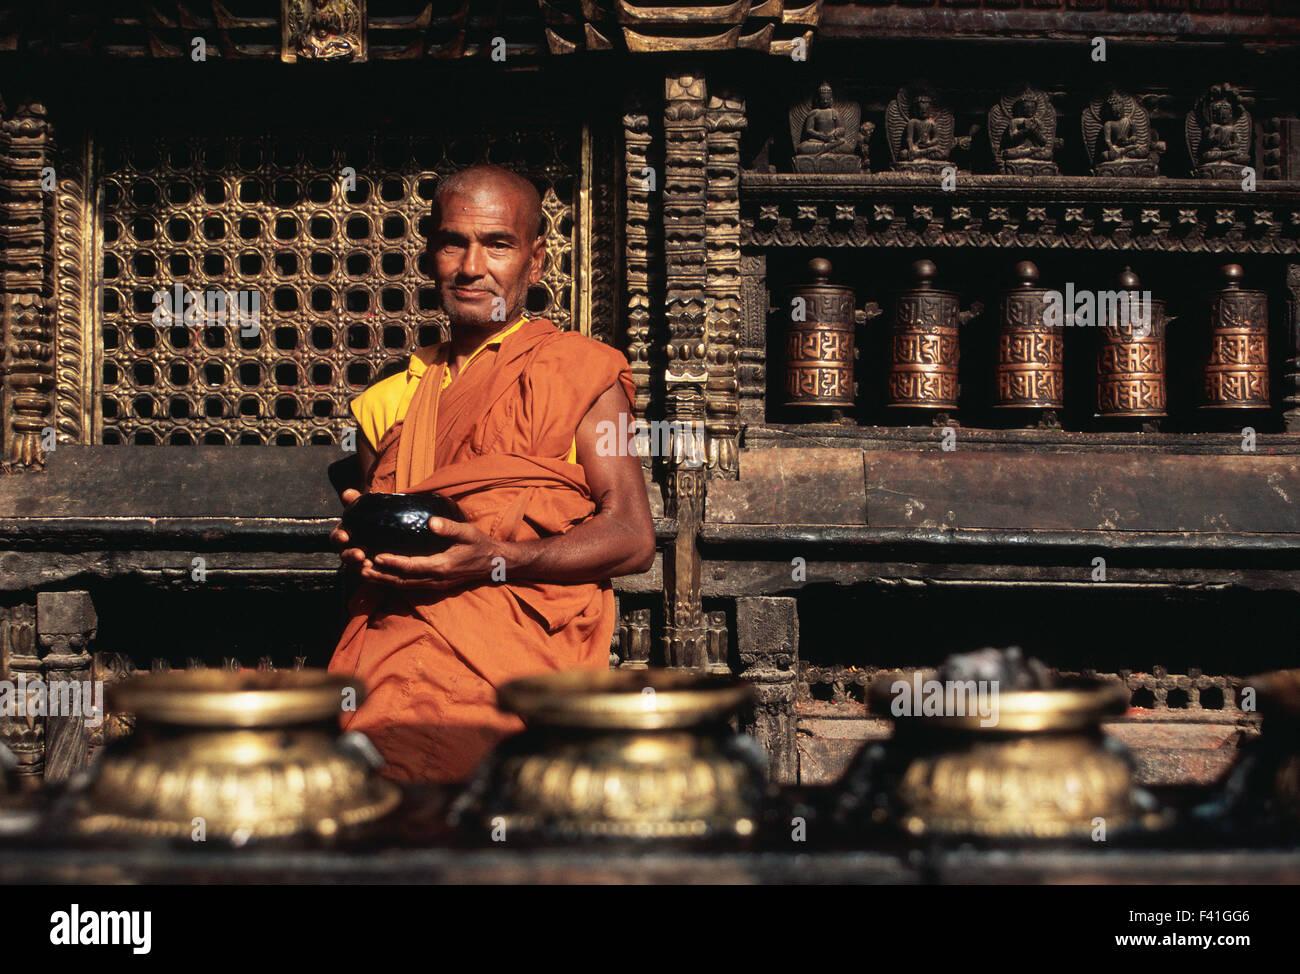 Monje budista theravada esperando la limosna en el templo Harati (Nepal) Foto de stock